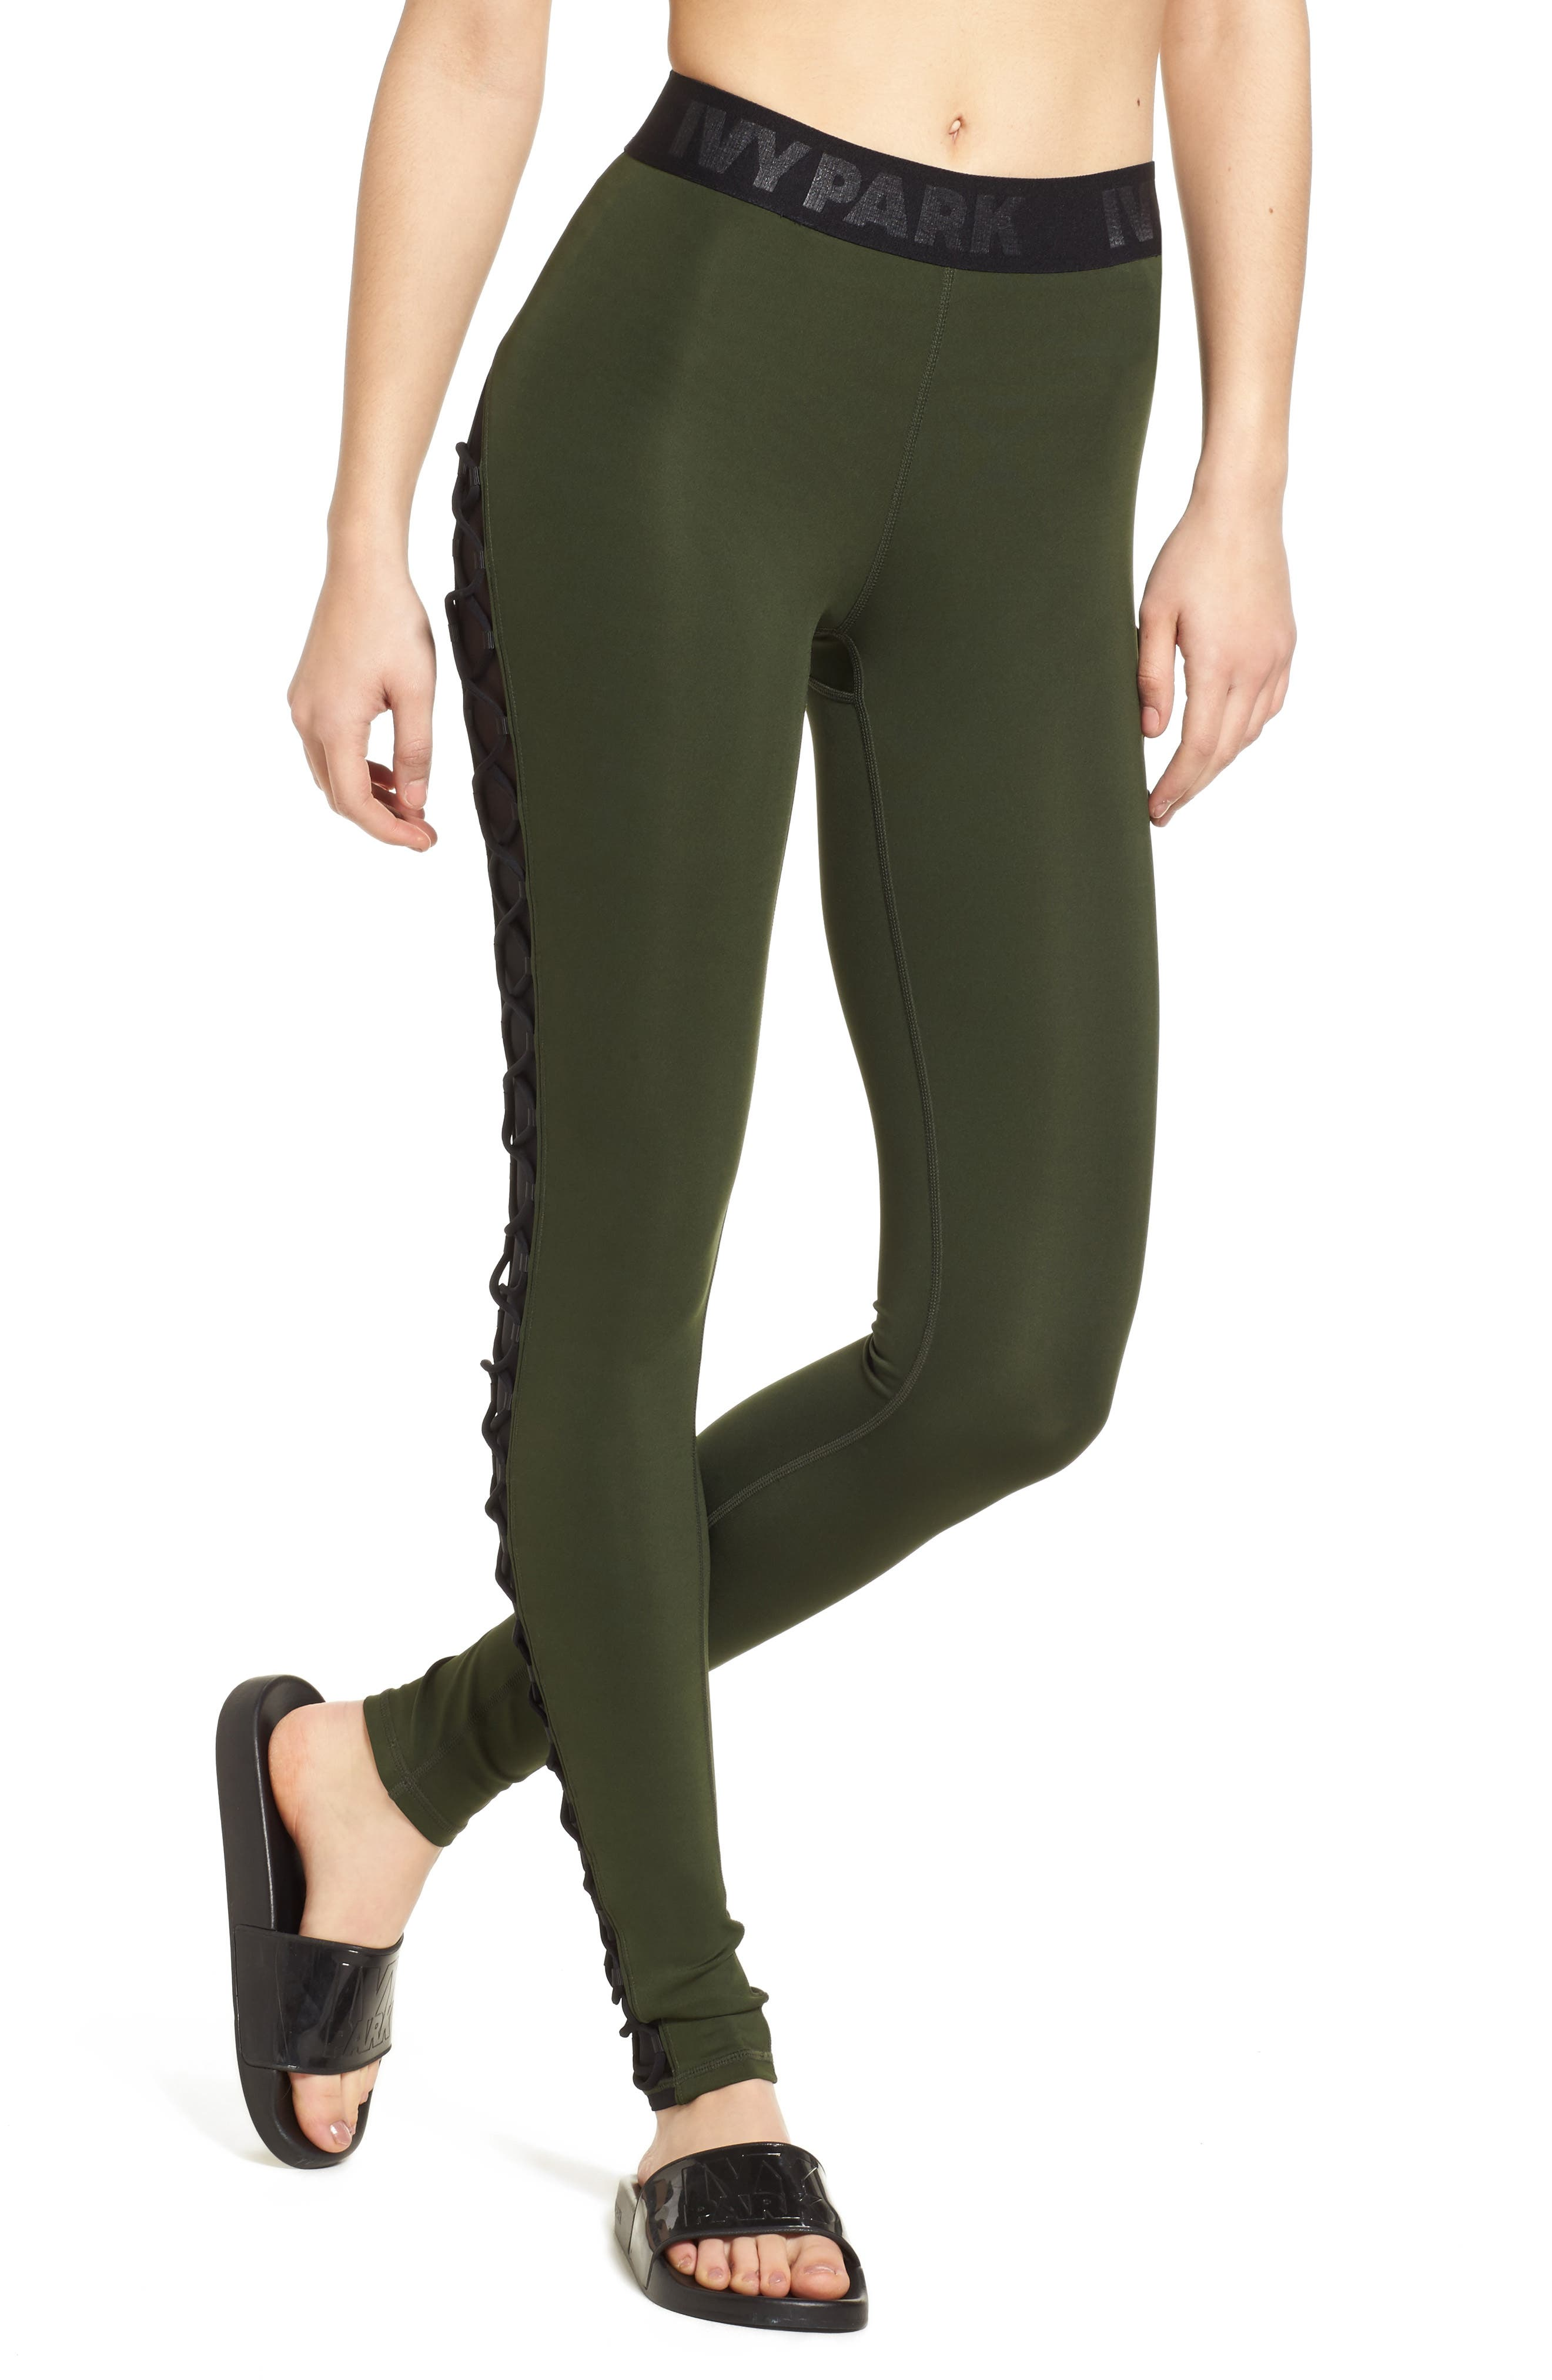 Alternate Image 1 Selected - Ivy Park® Mesh Lace-Up Leggings